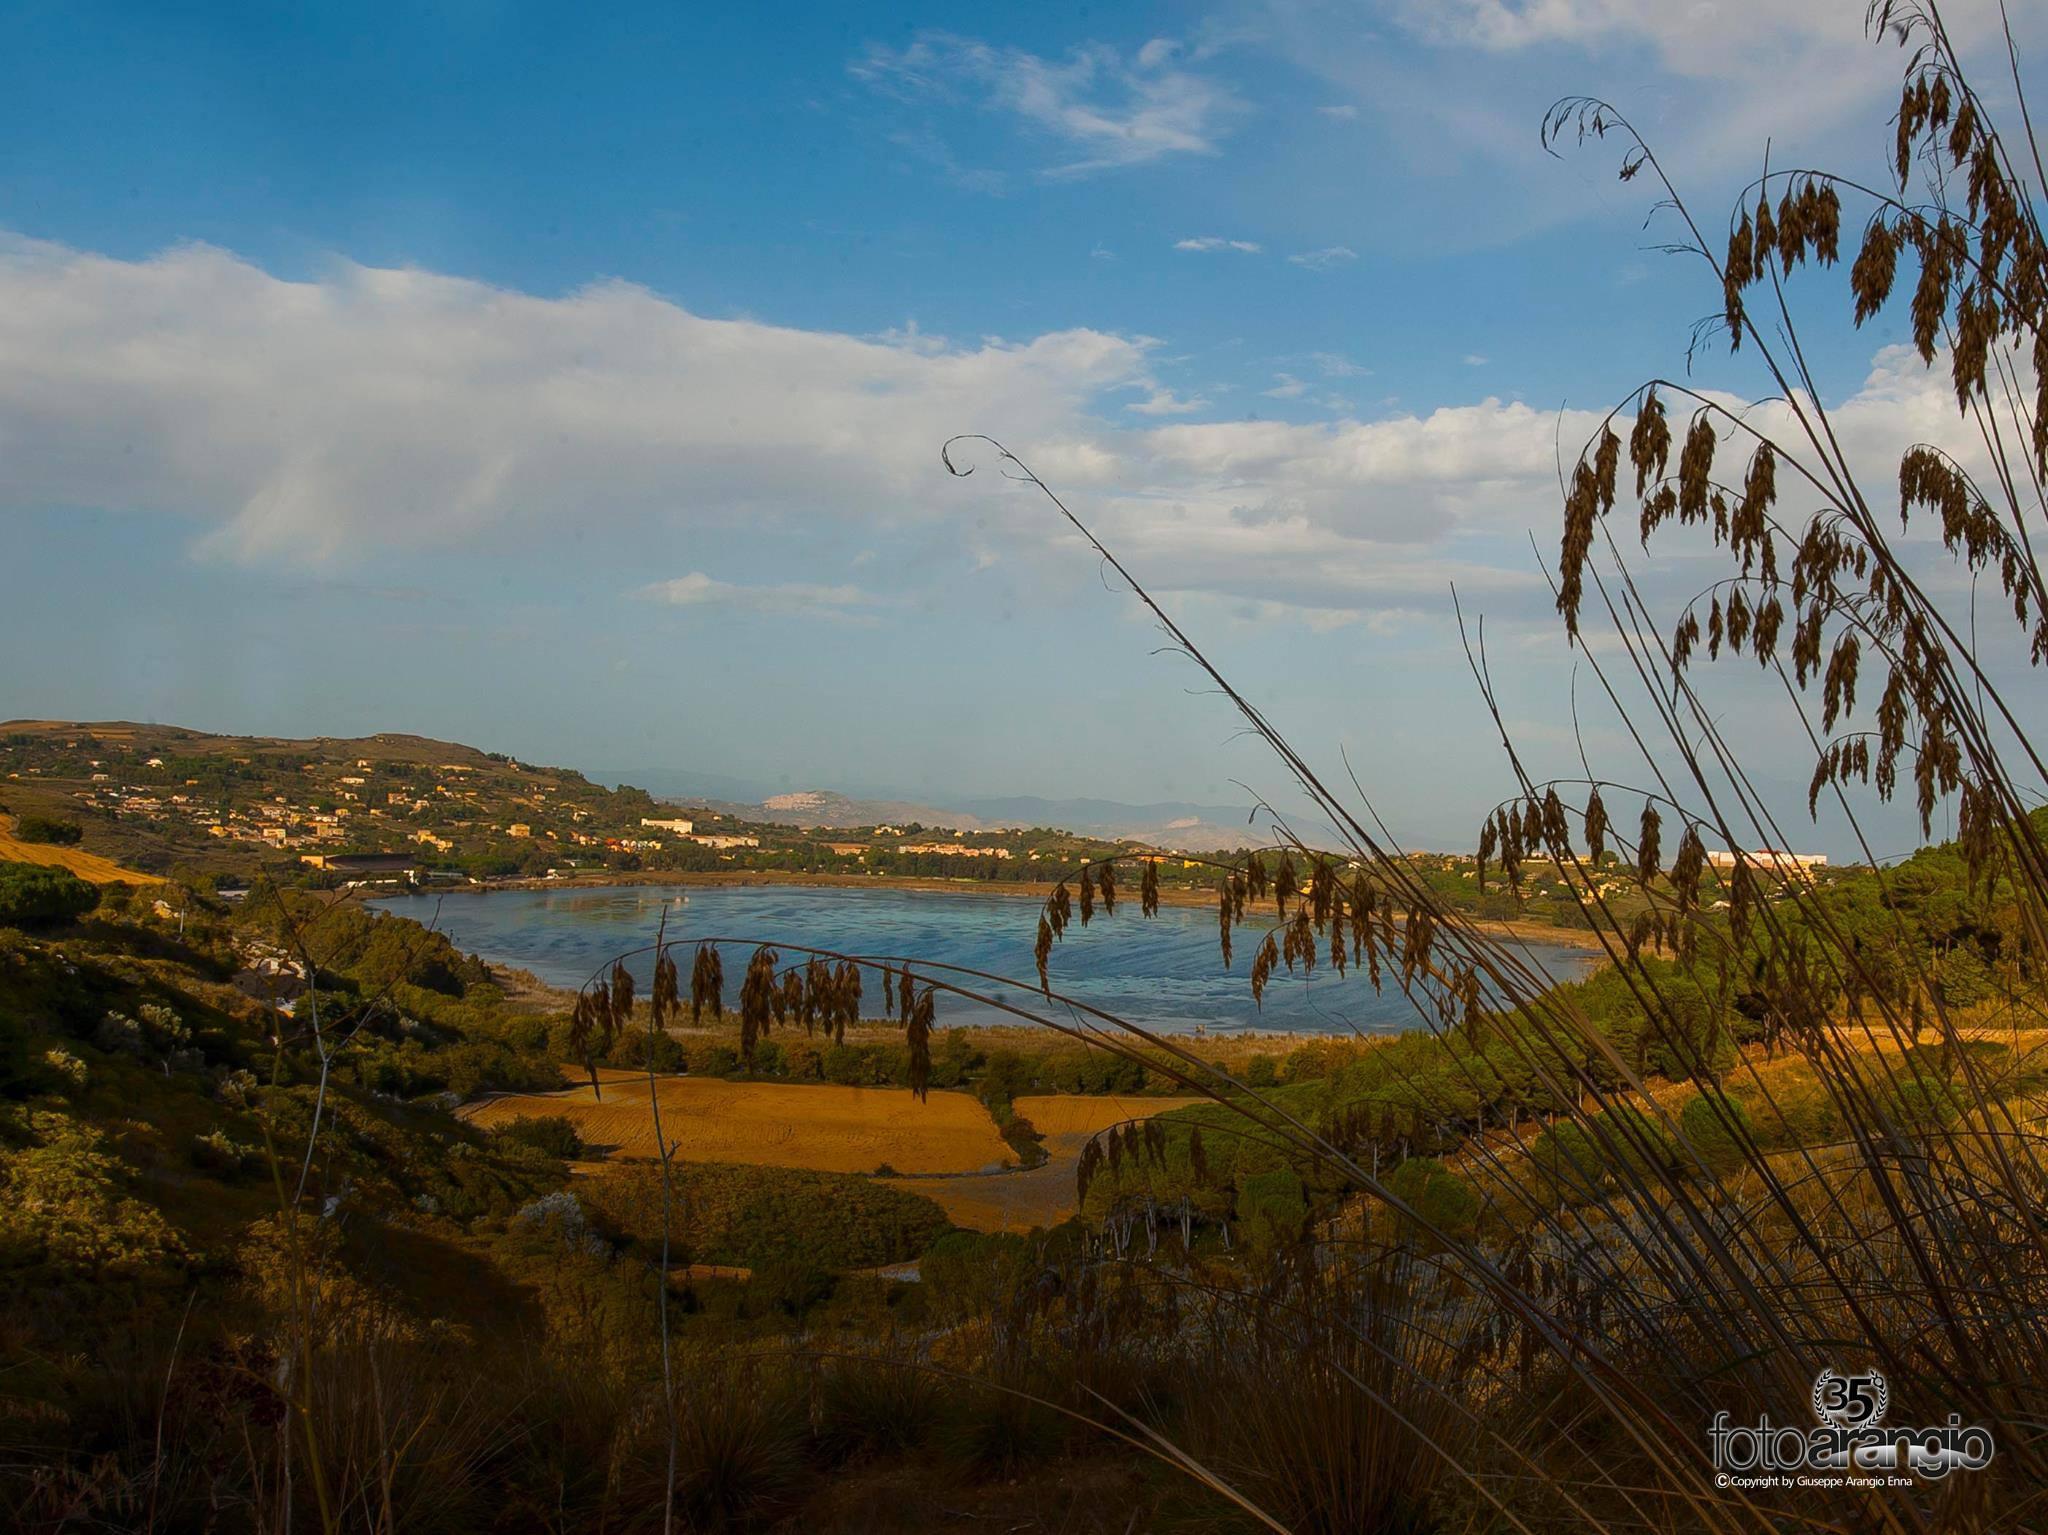 12304477_1101022276589223_6001205054739752370_o | Visit Sicily